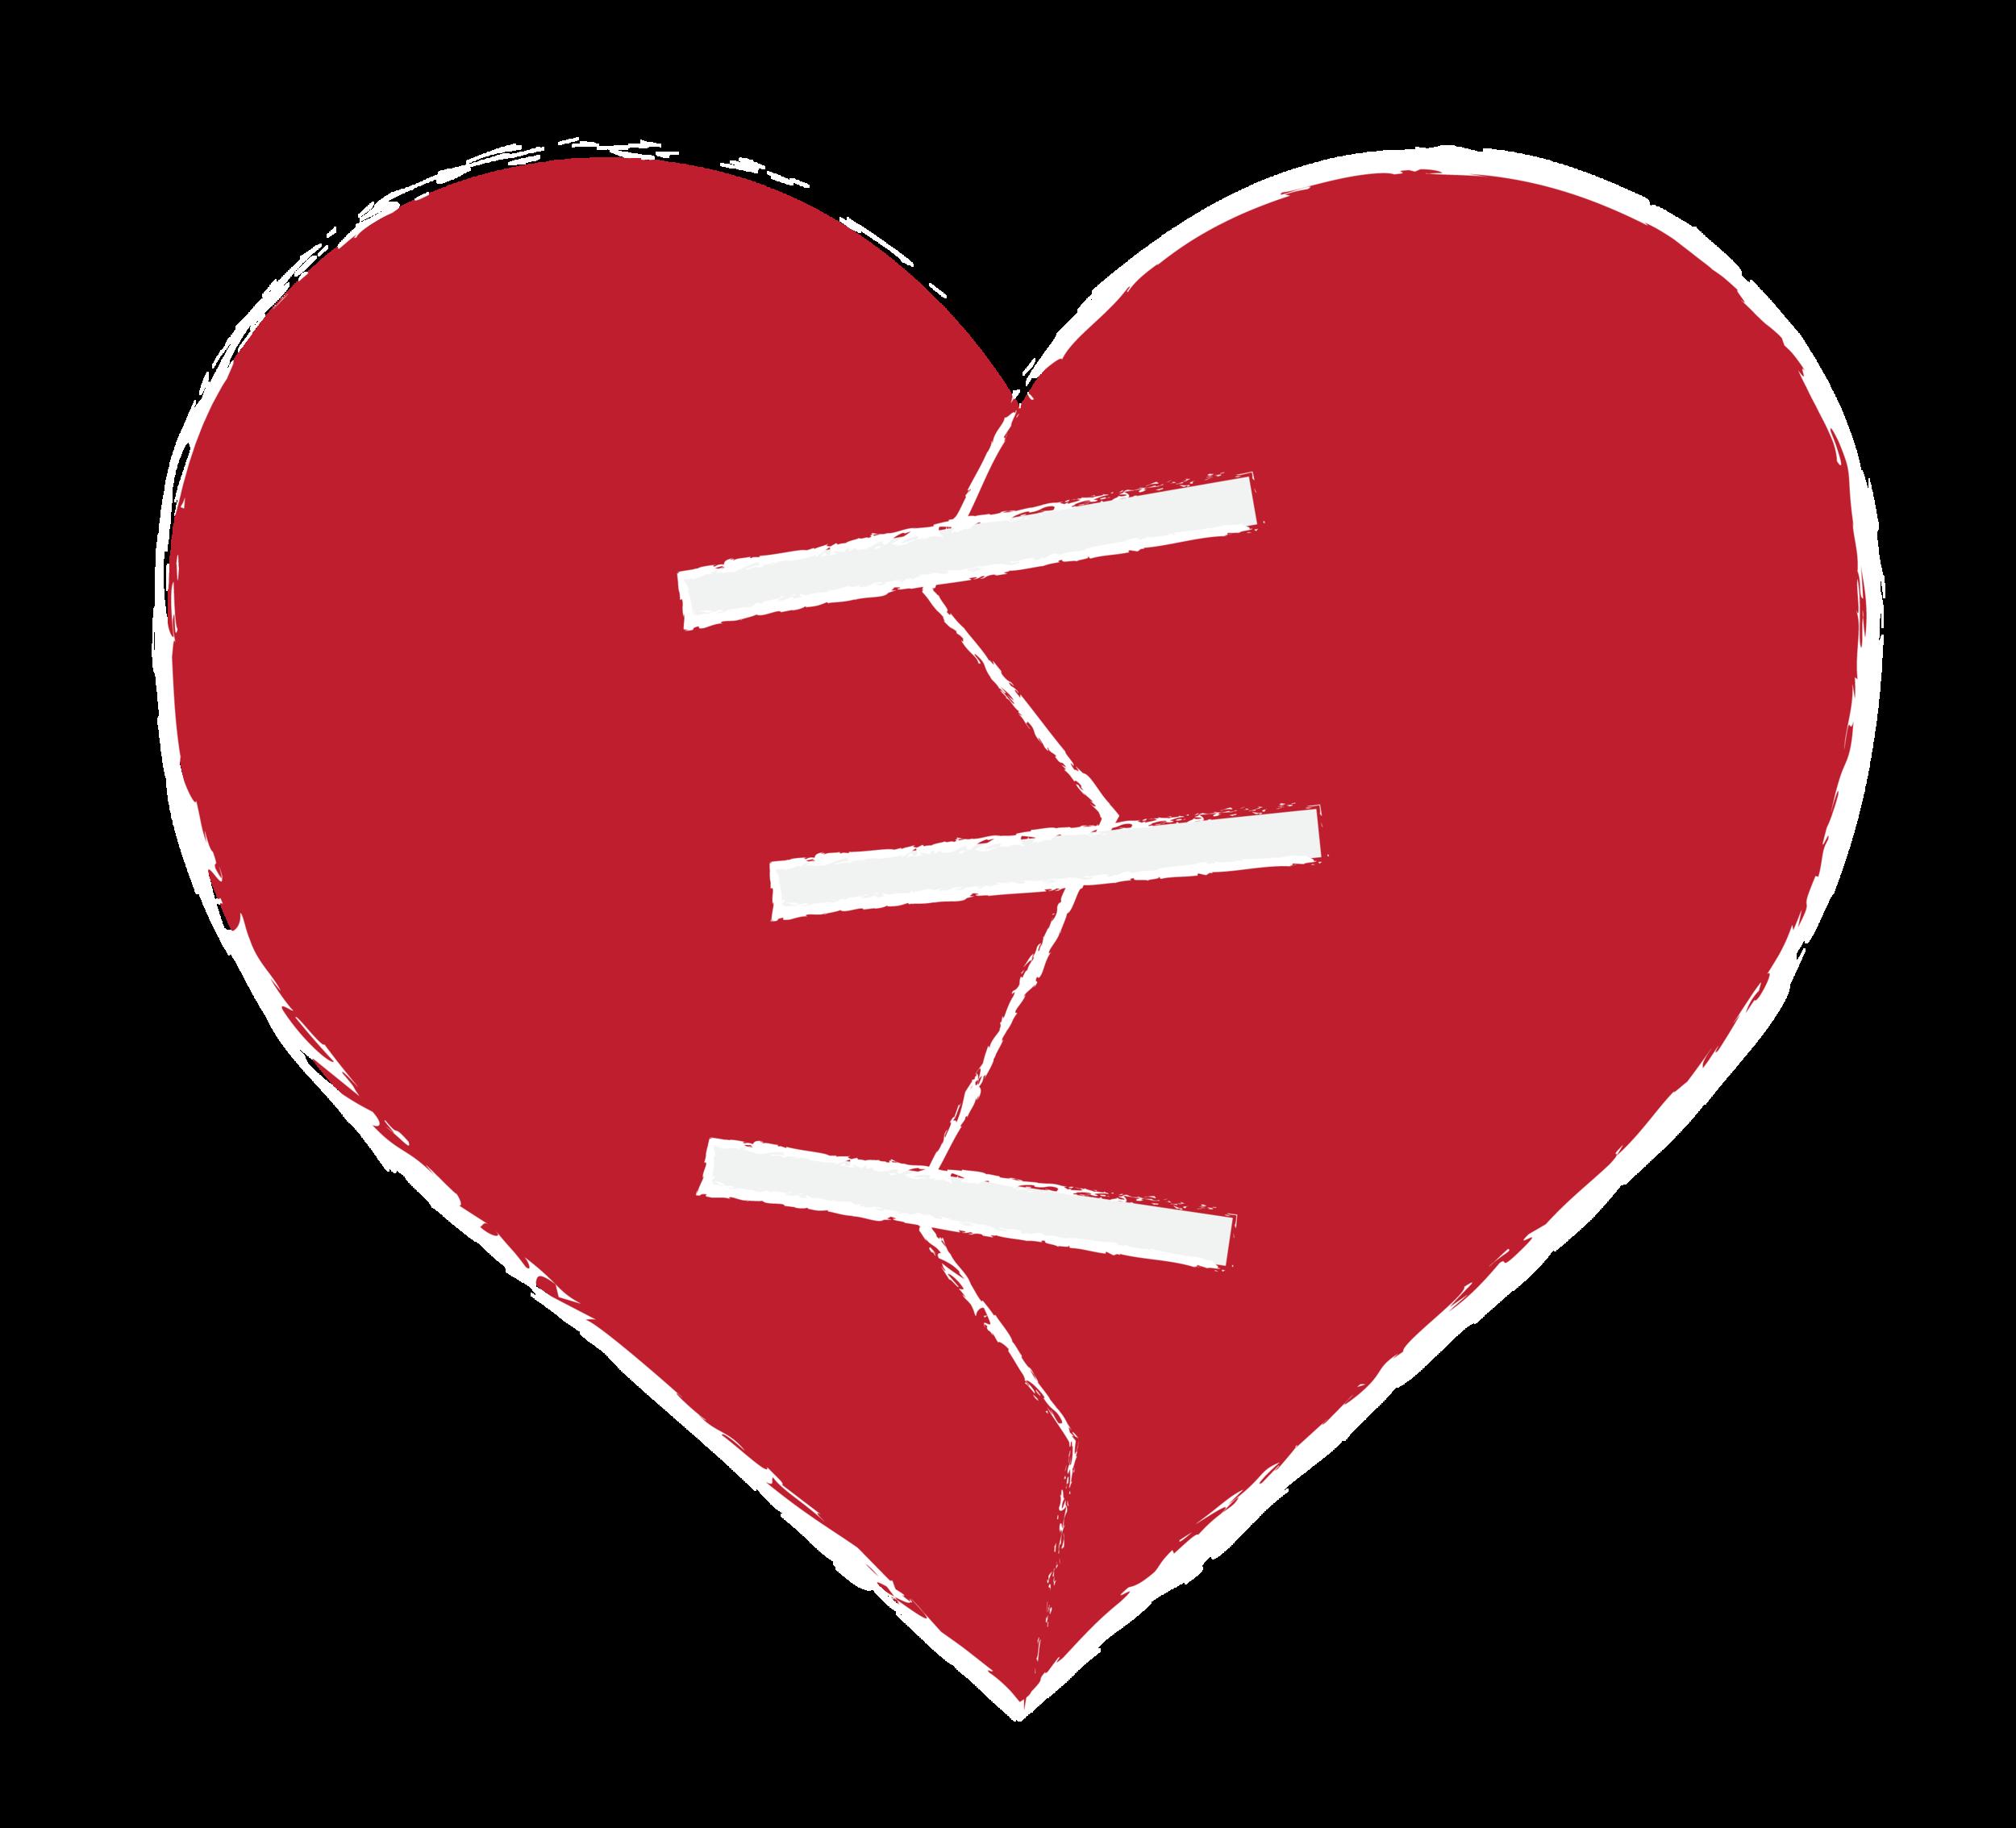 LL_HEART_LOGO_Artboard 2@3x.png